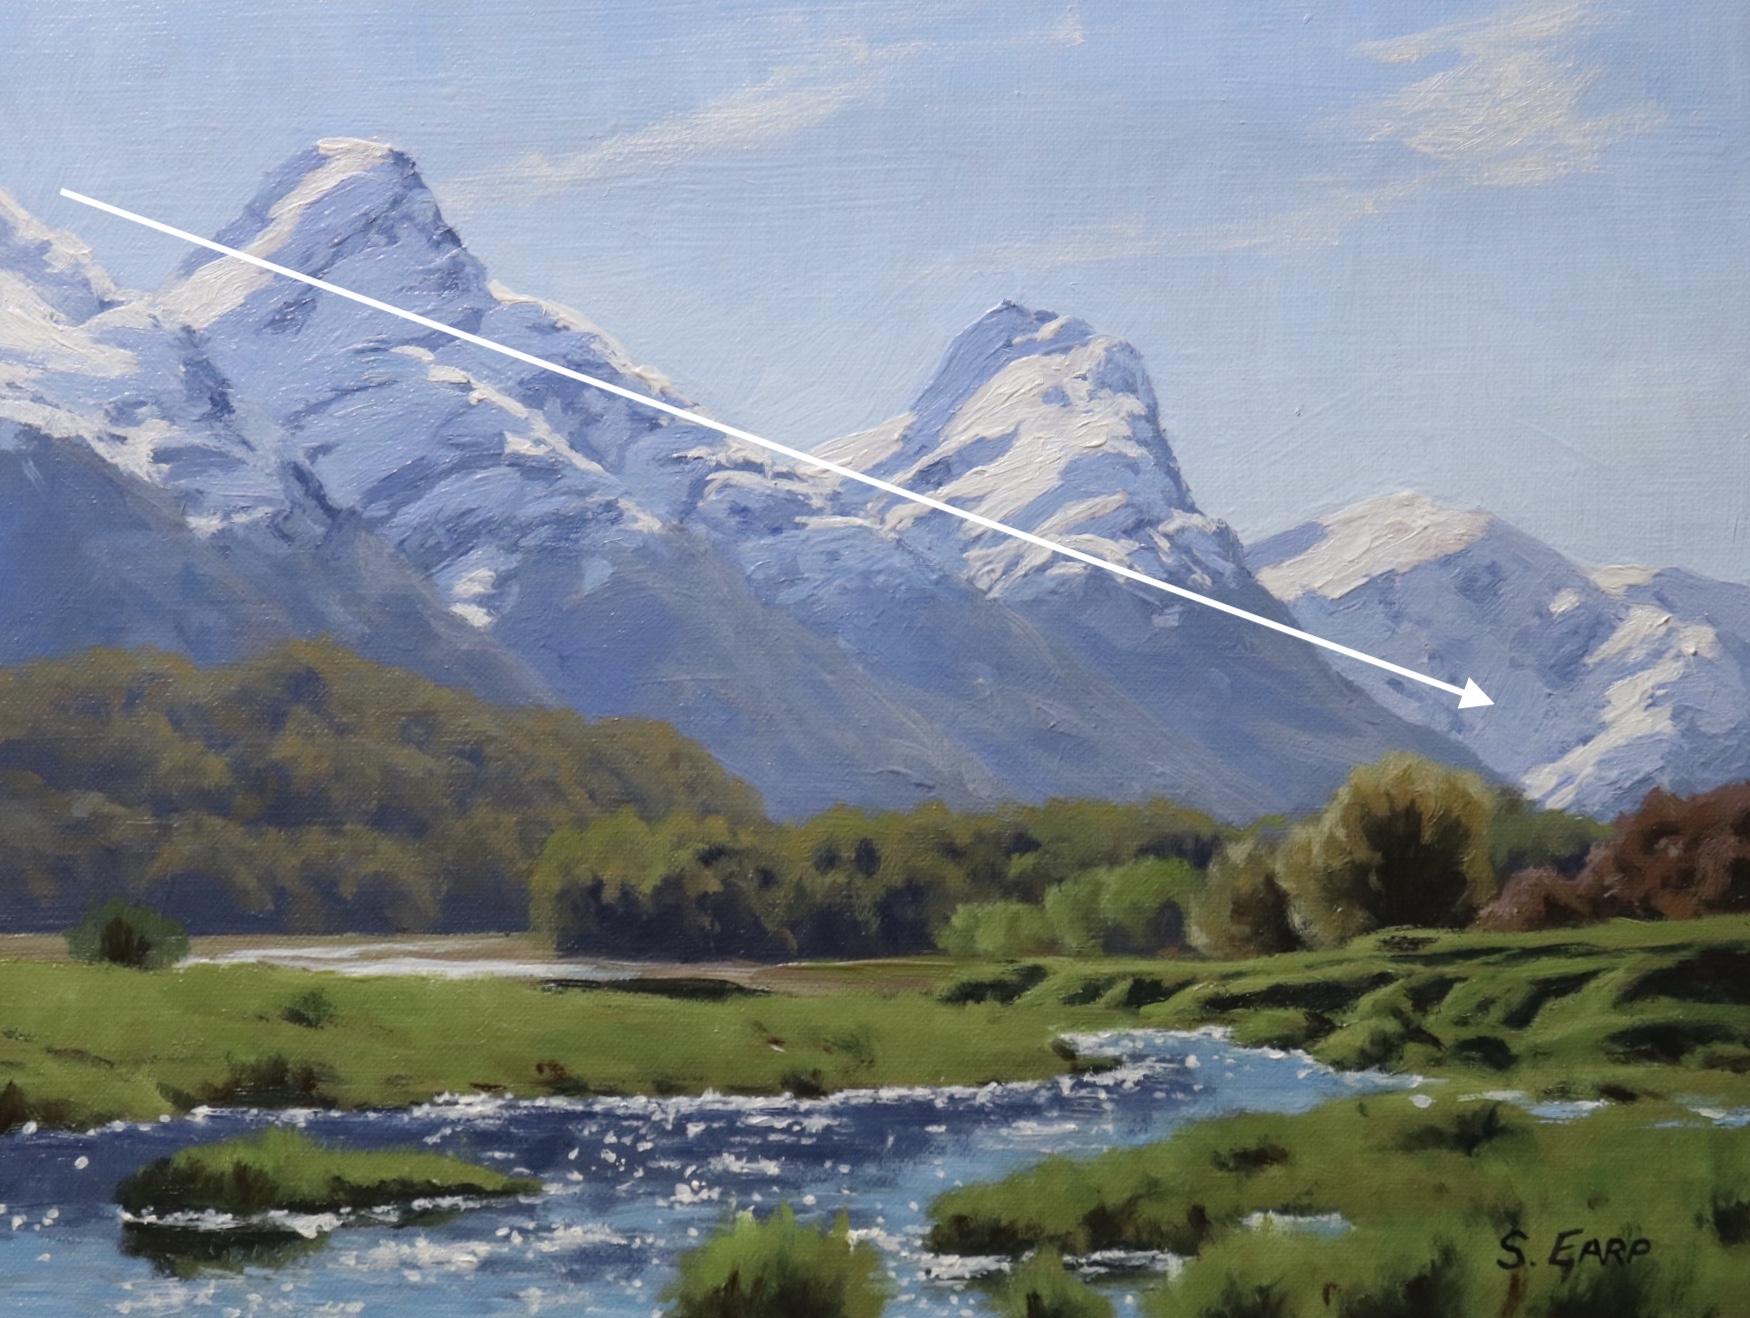 Diagonal Line Composition - Paradise New Zealand - oil painting - Samuel Earp copy.jpg